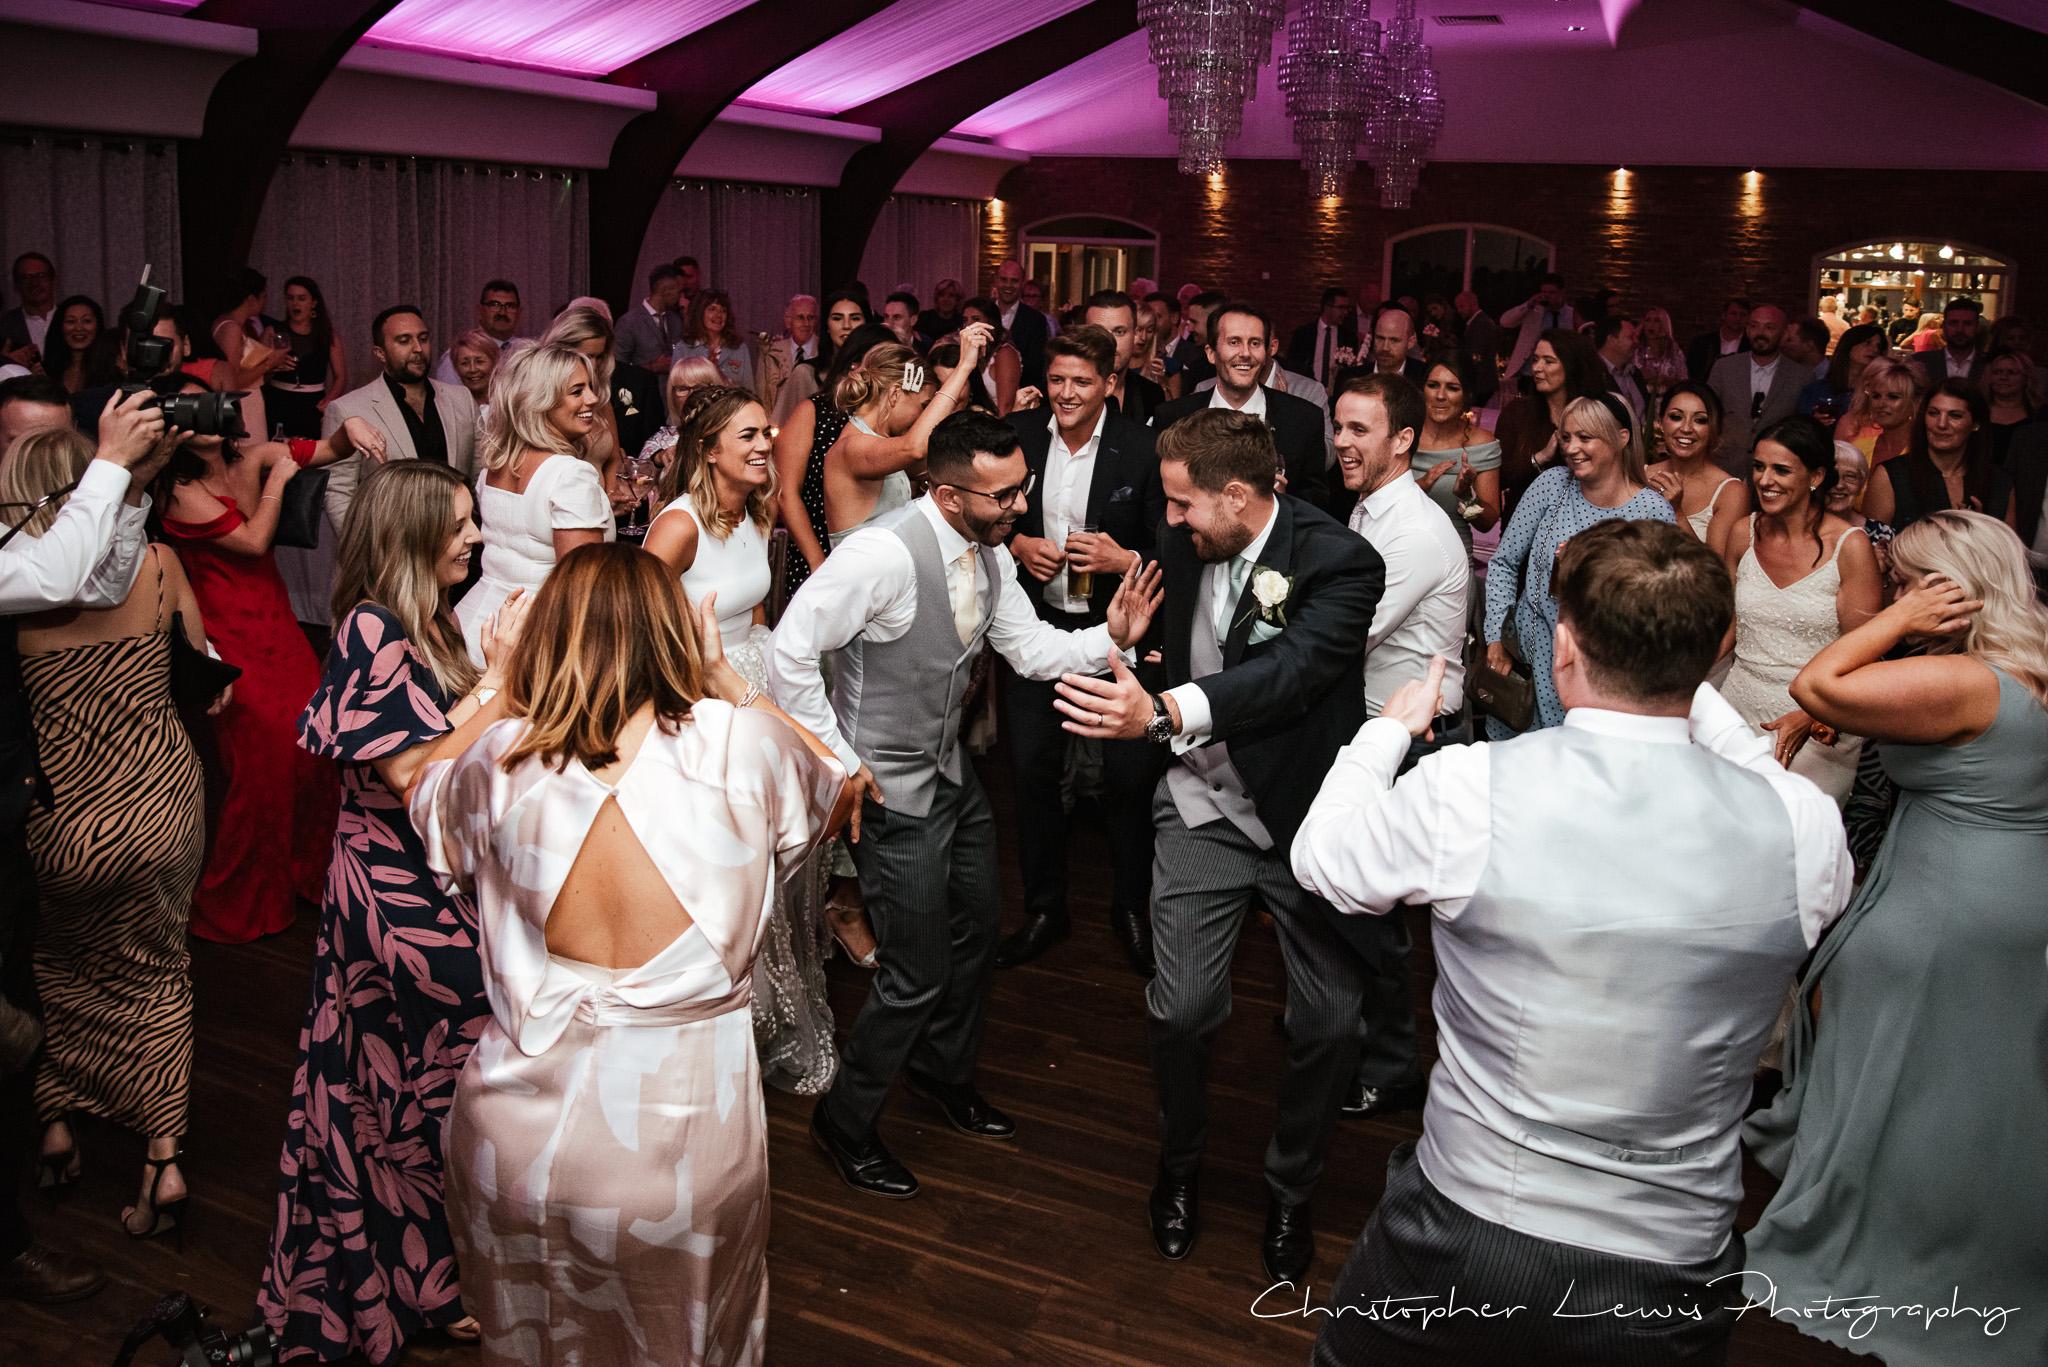 Colshaw Hall Wedding dancing